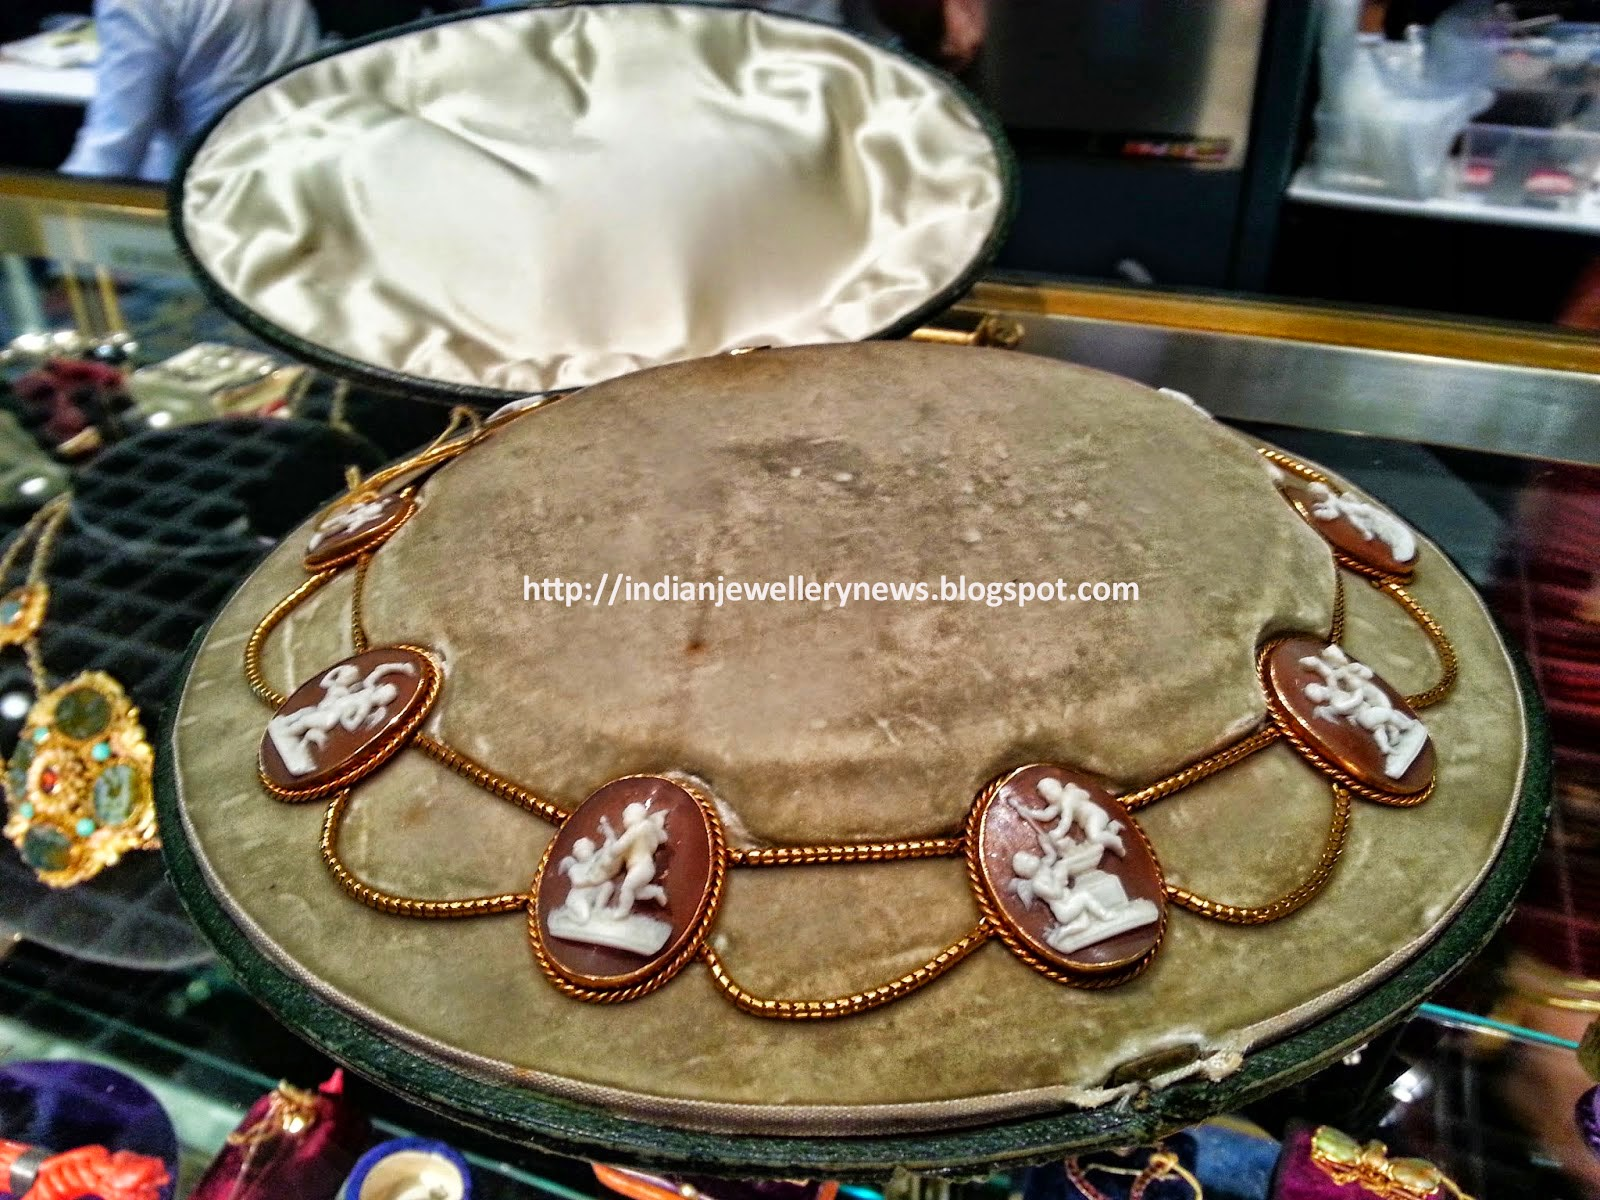 Antique Jewelry Show at Las Vegas